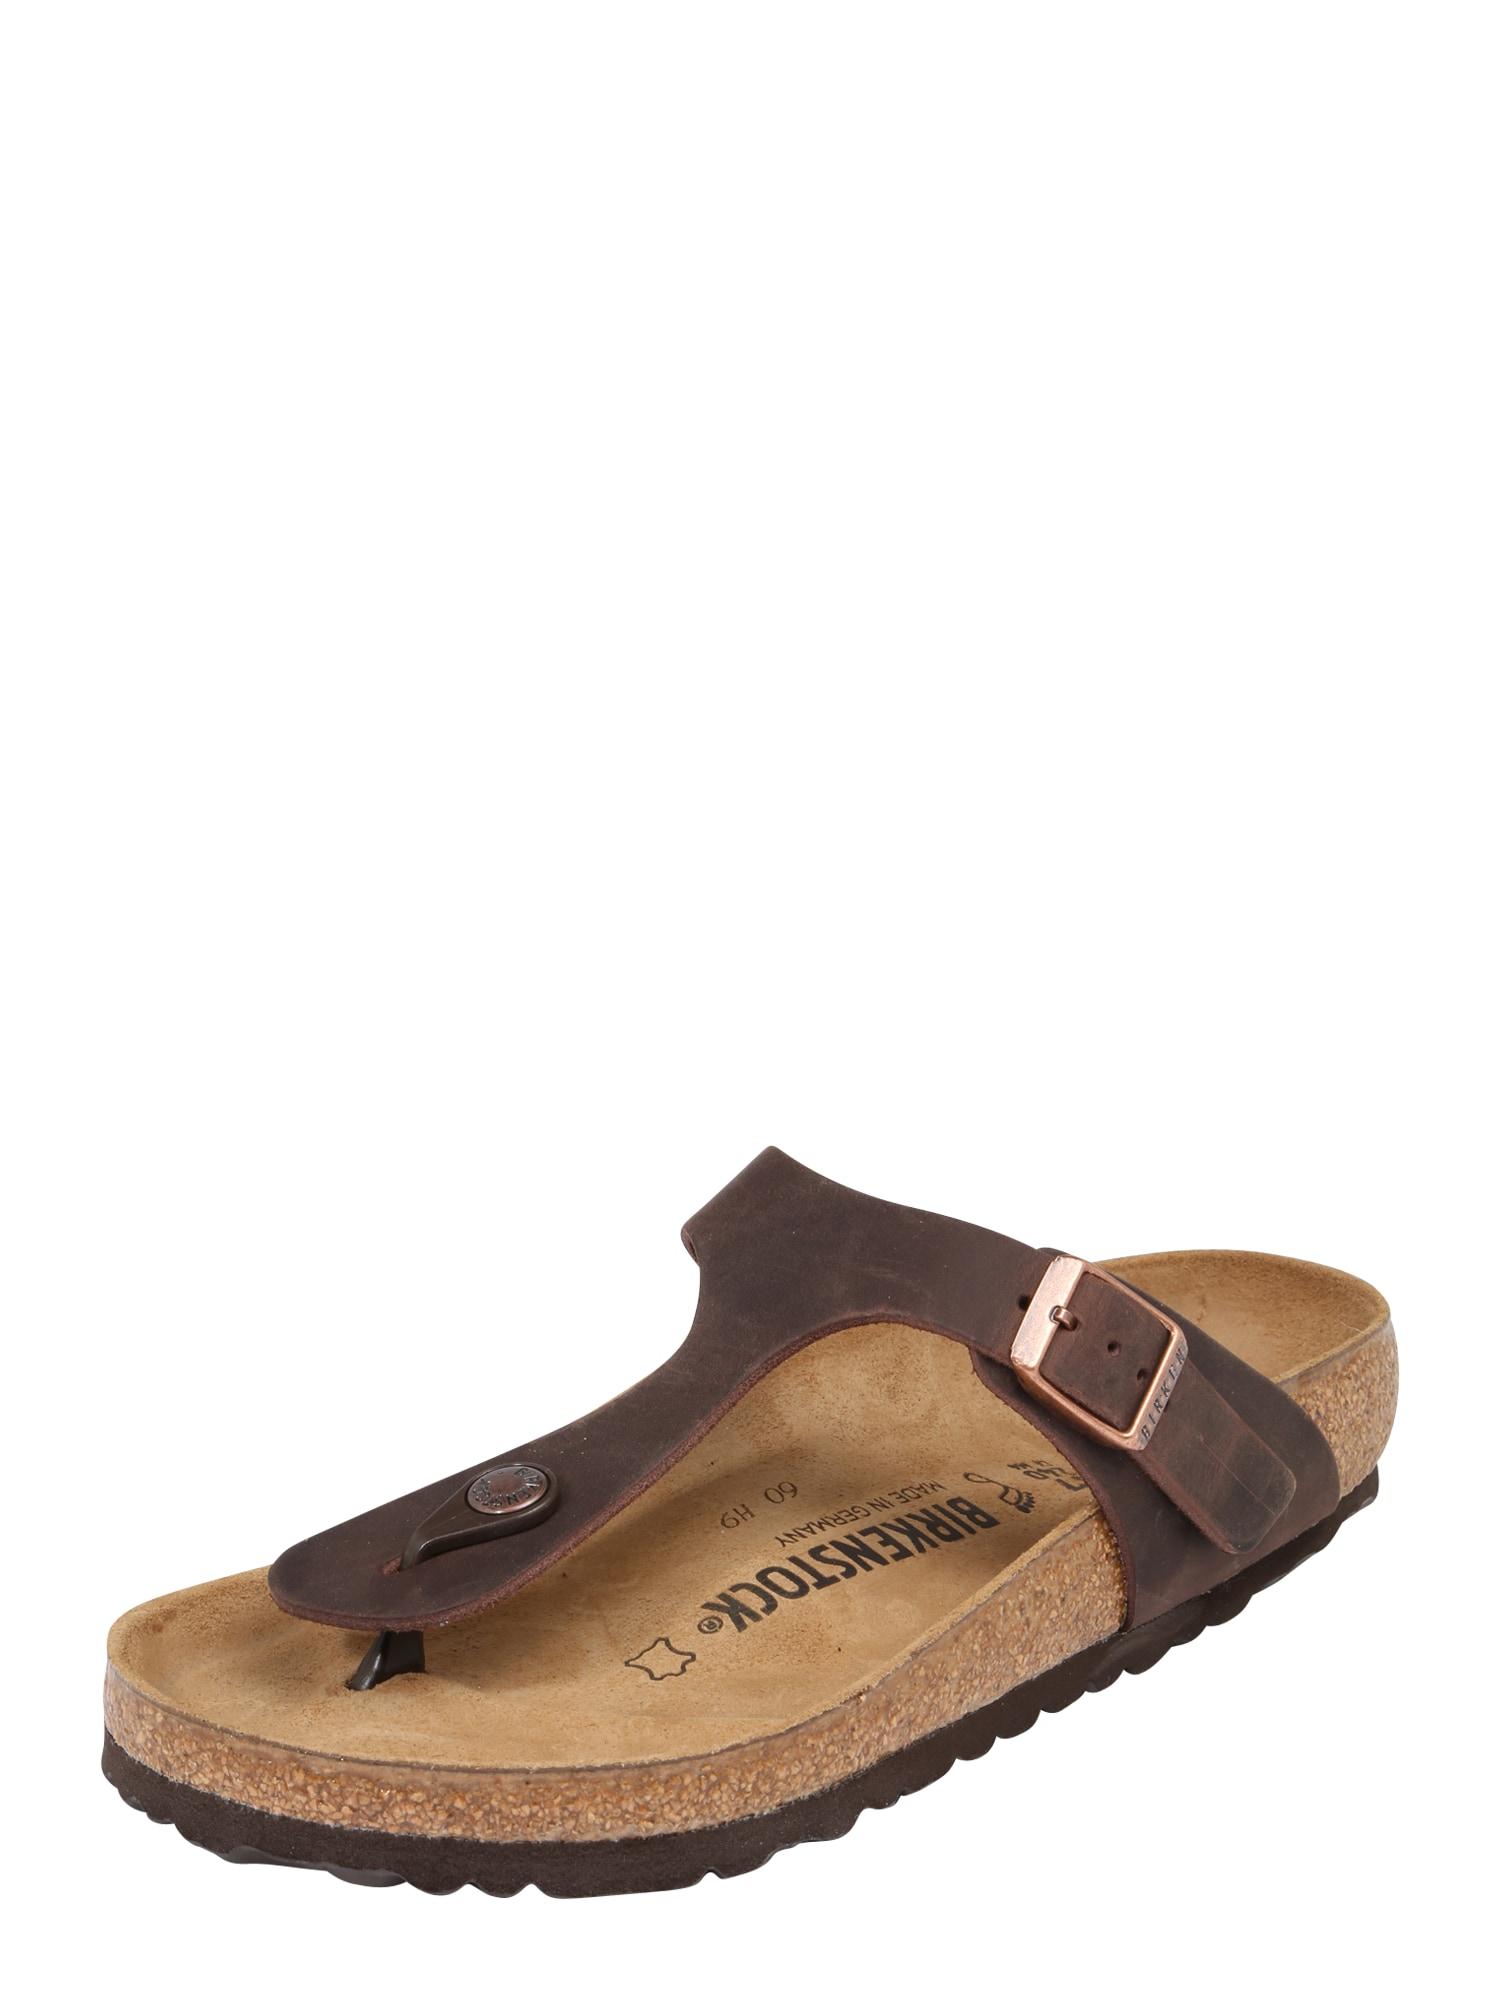 BIRKENSTOCK Sandalai 'Gizeh' kaštoninė spalva / ruda